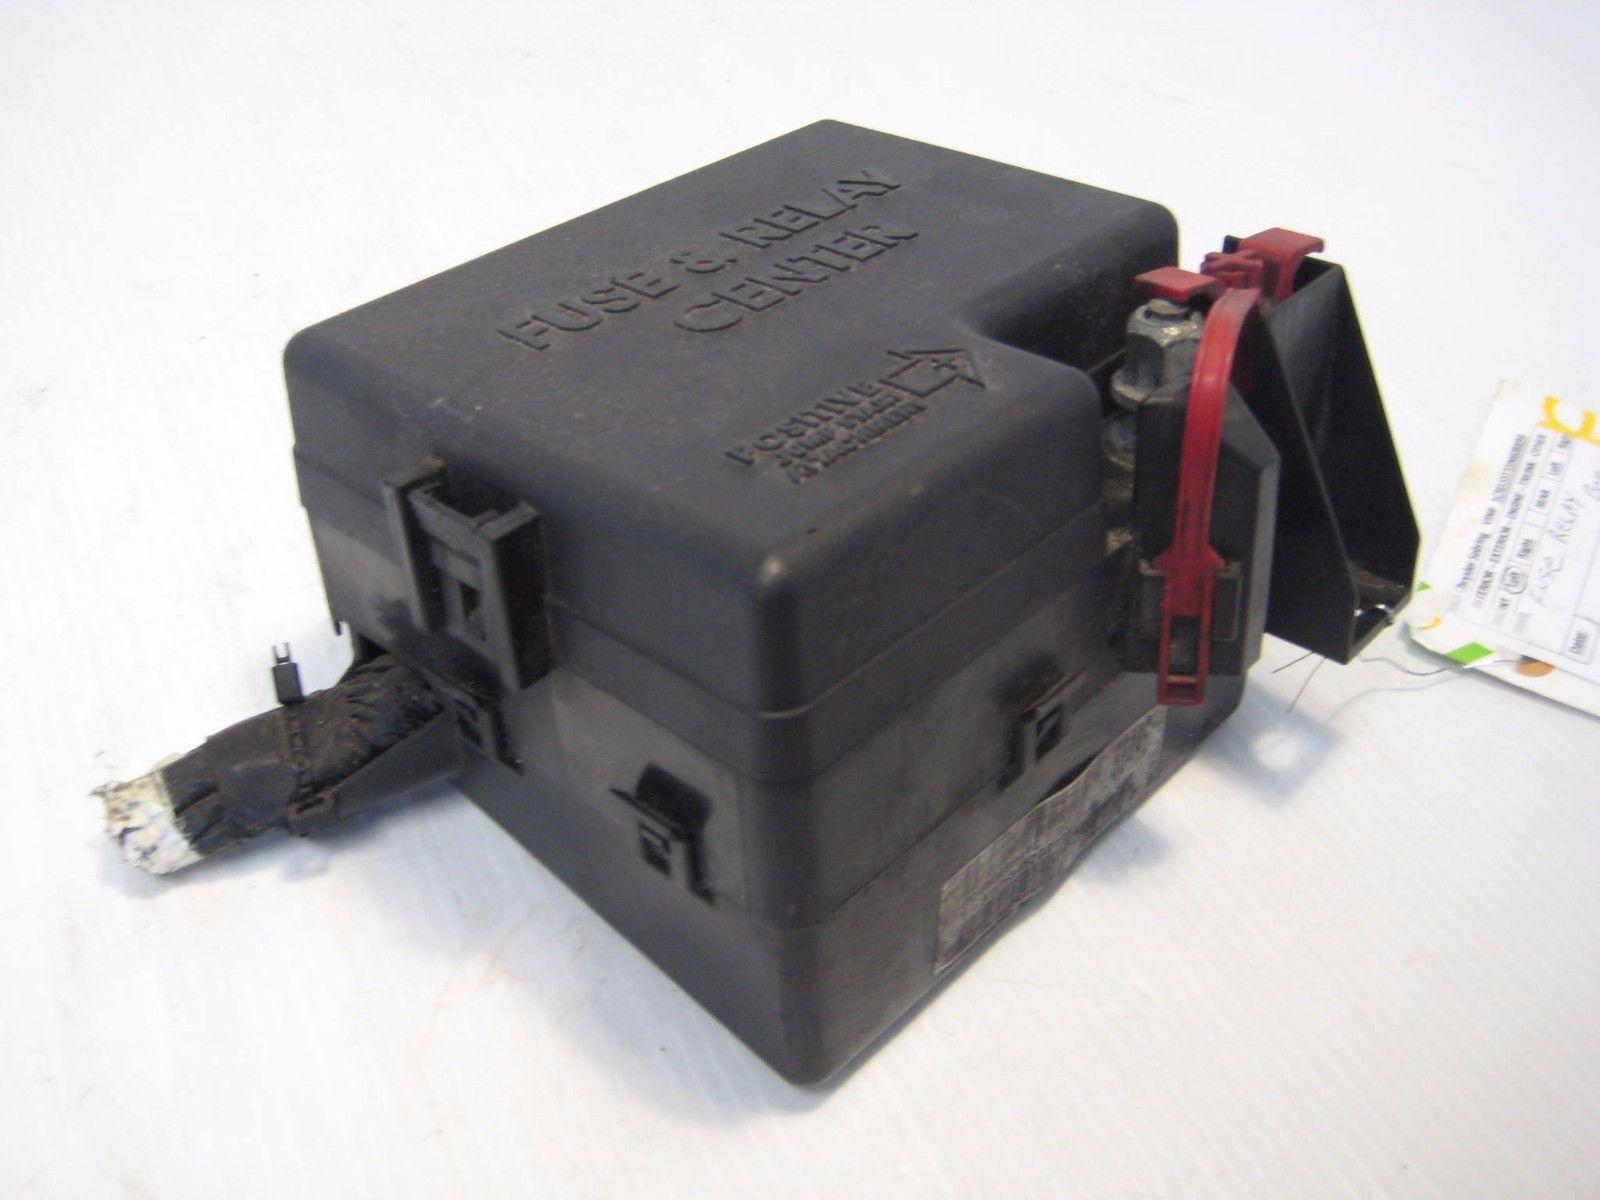 2003 Chrysler Sebring Engine Fuse Relay Box Compartment